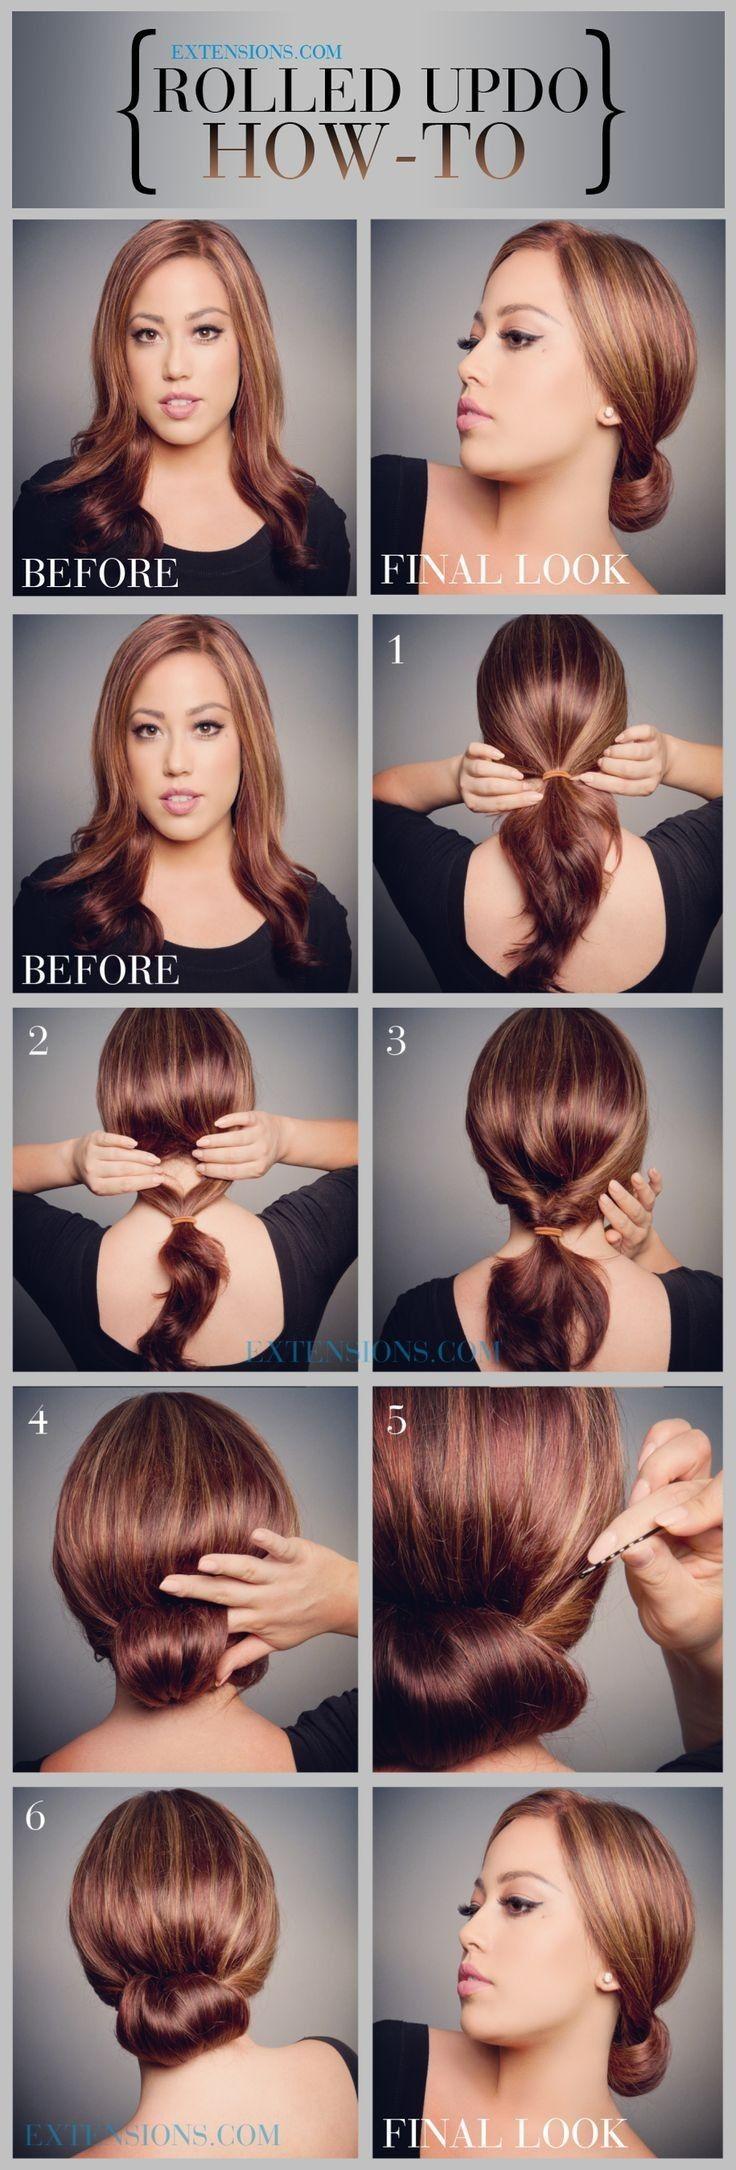 12 Trendy Low Bun Updo Hairstyles Tutorials